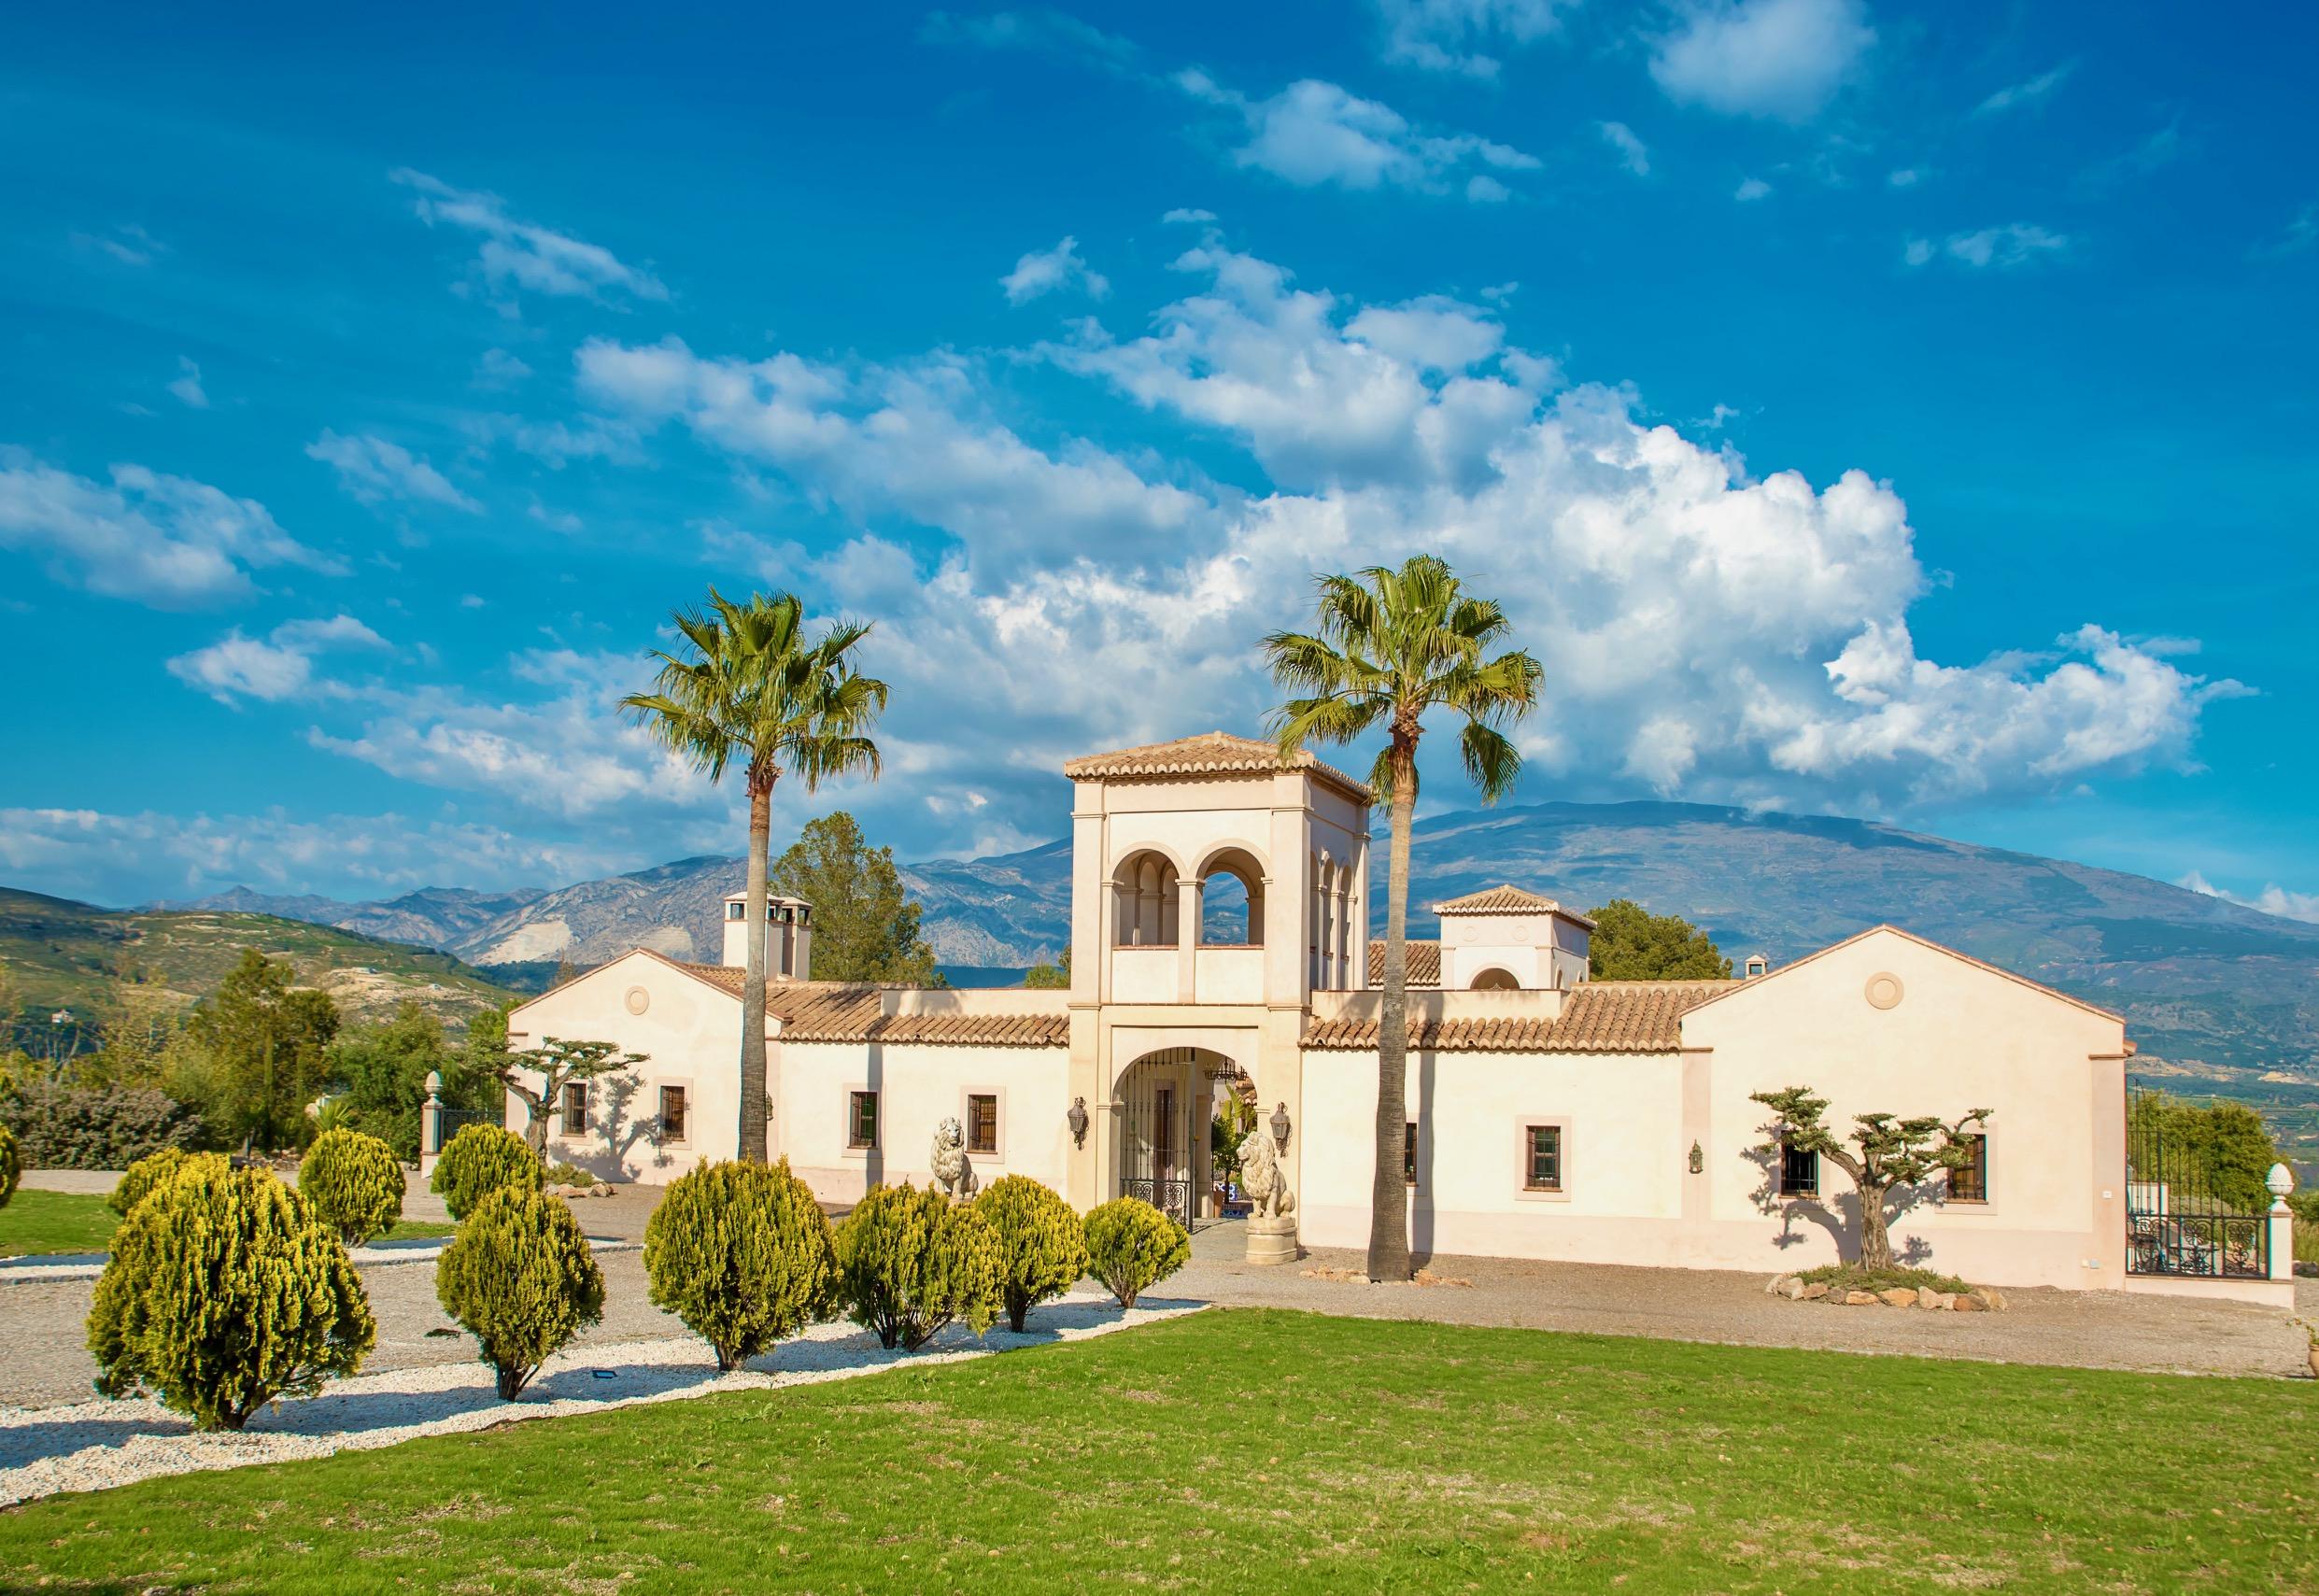 The best hotel in Granada